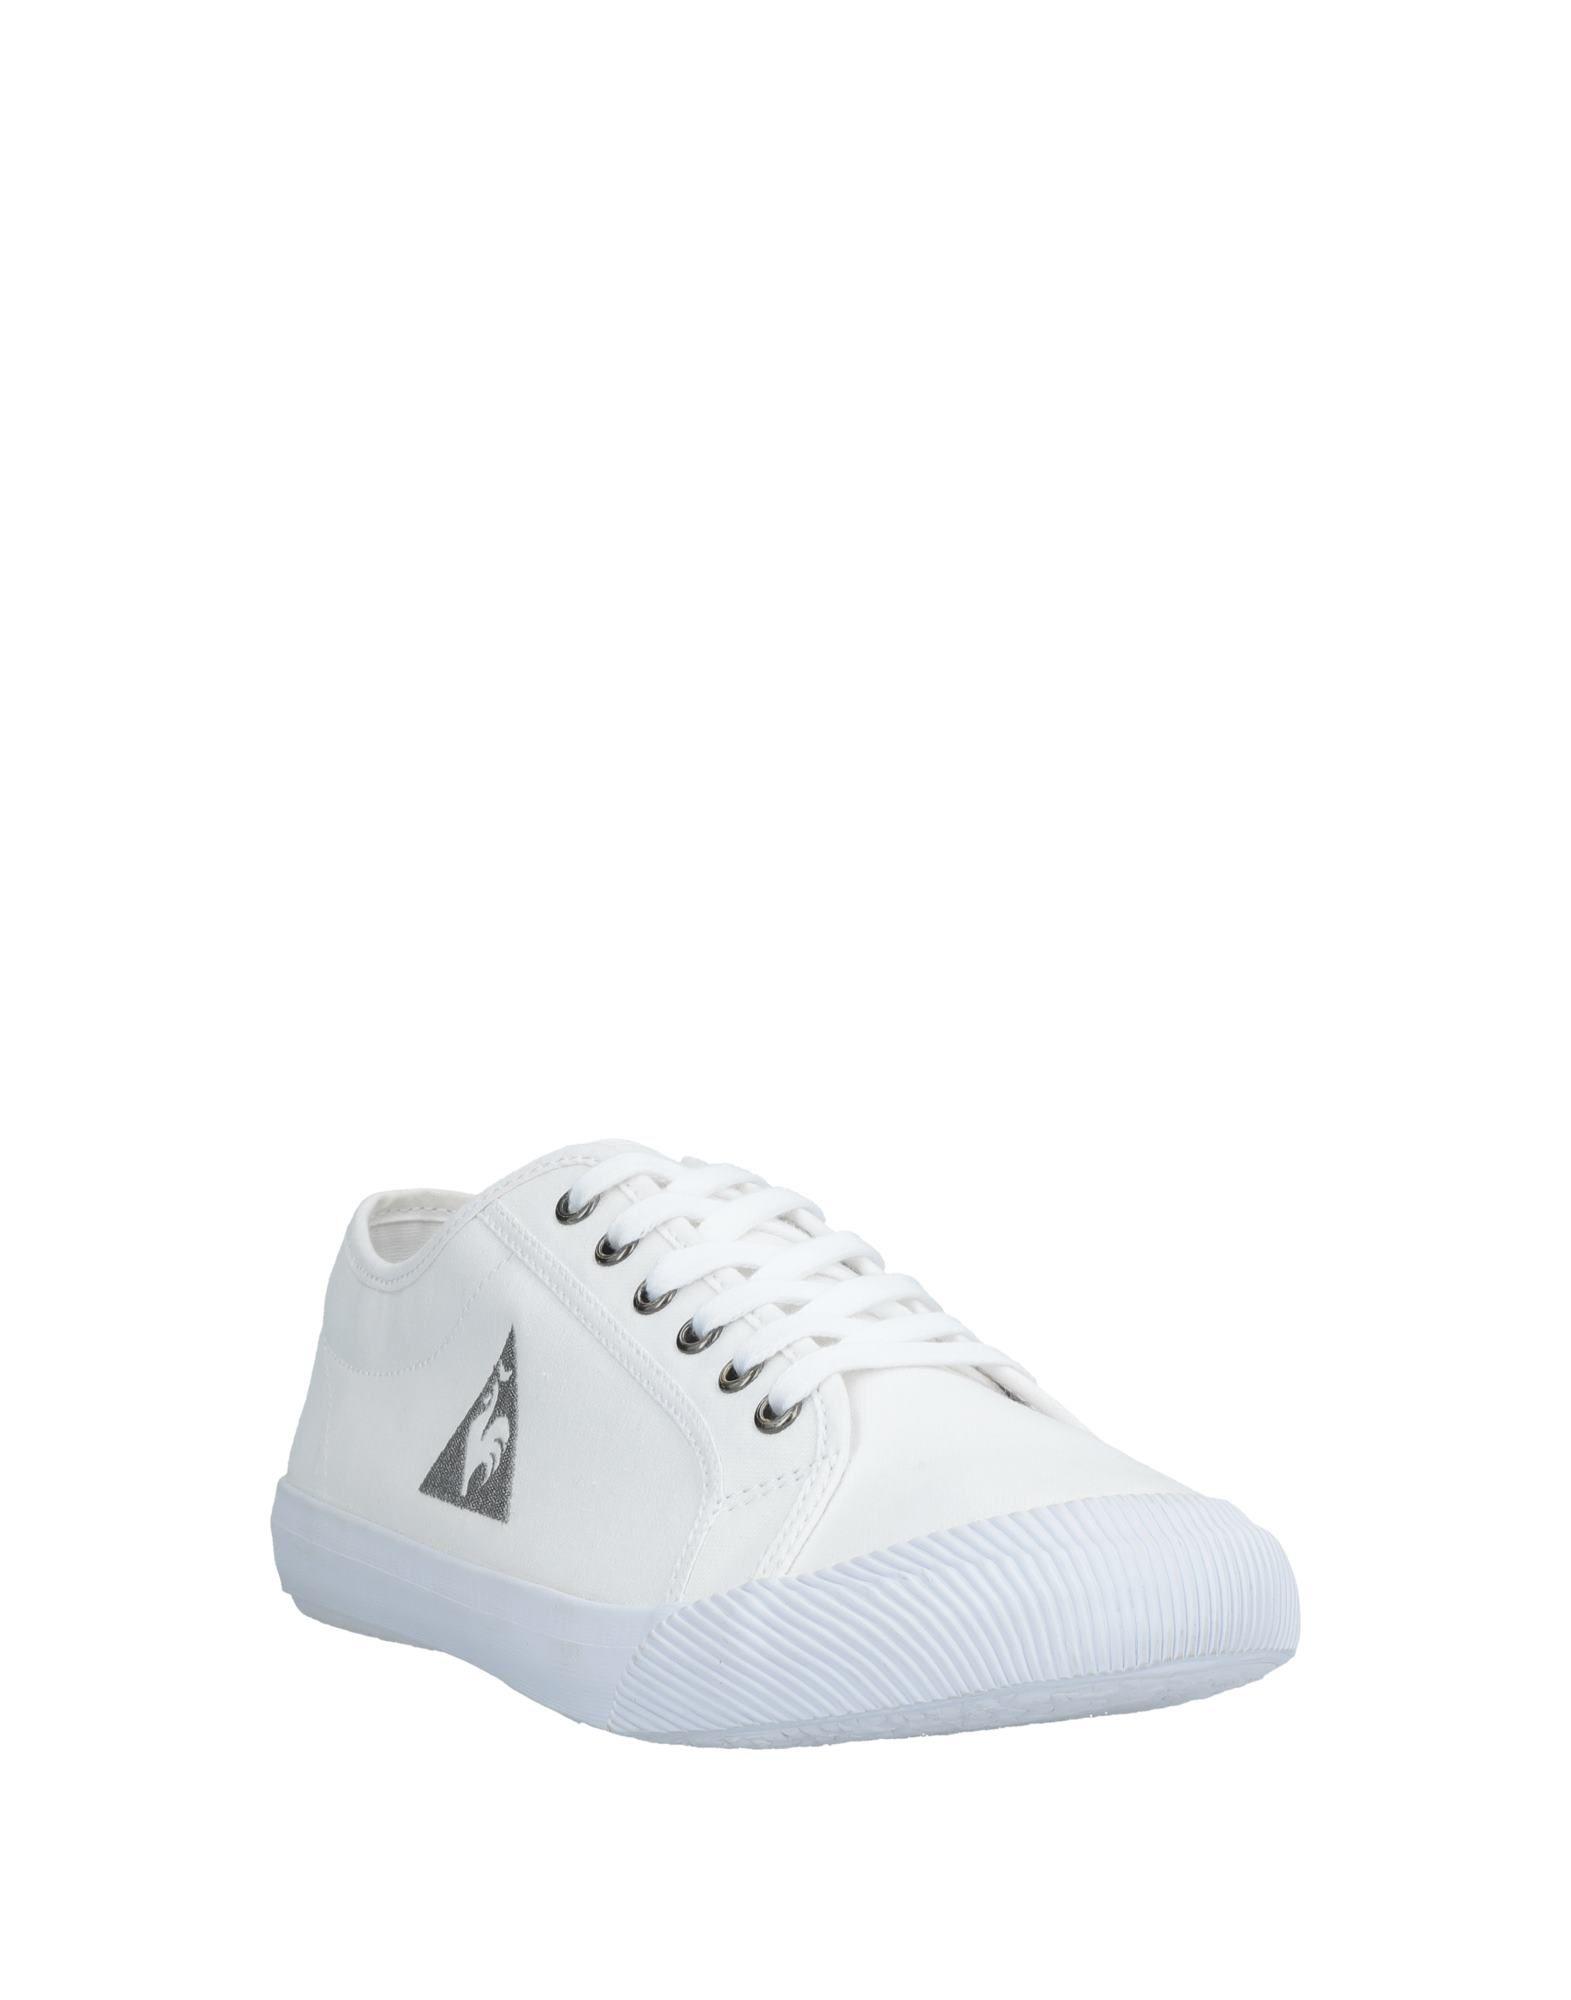 ... Rabatt echte Schuhe Herren Le Coq Sportif Sneakers Herren Schuhe  11534340FC 00d8f7 ... be3296dd5a